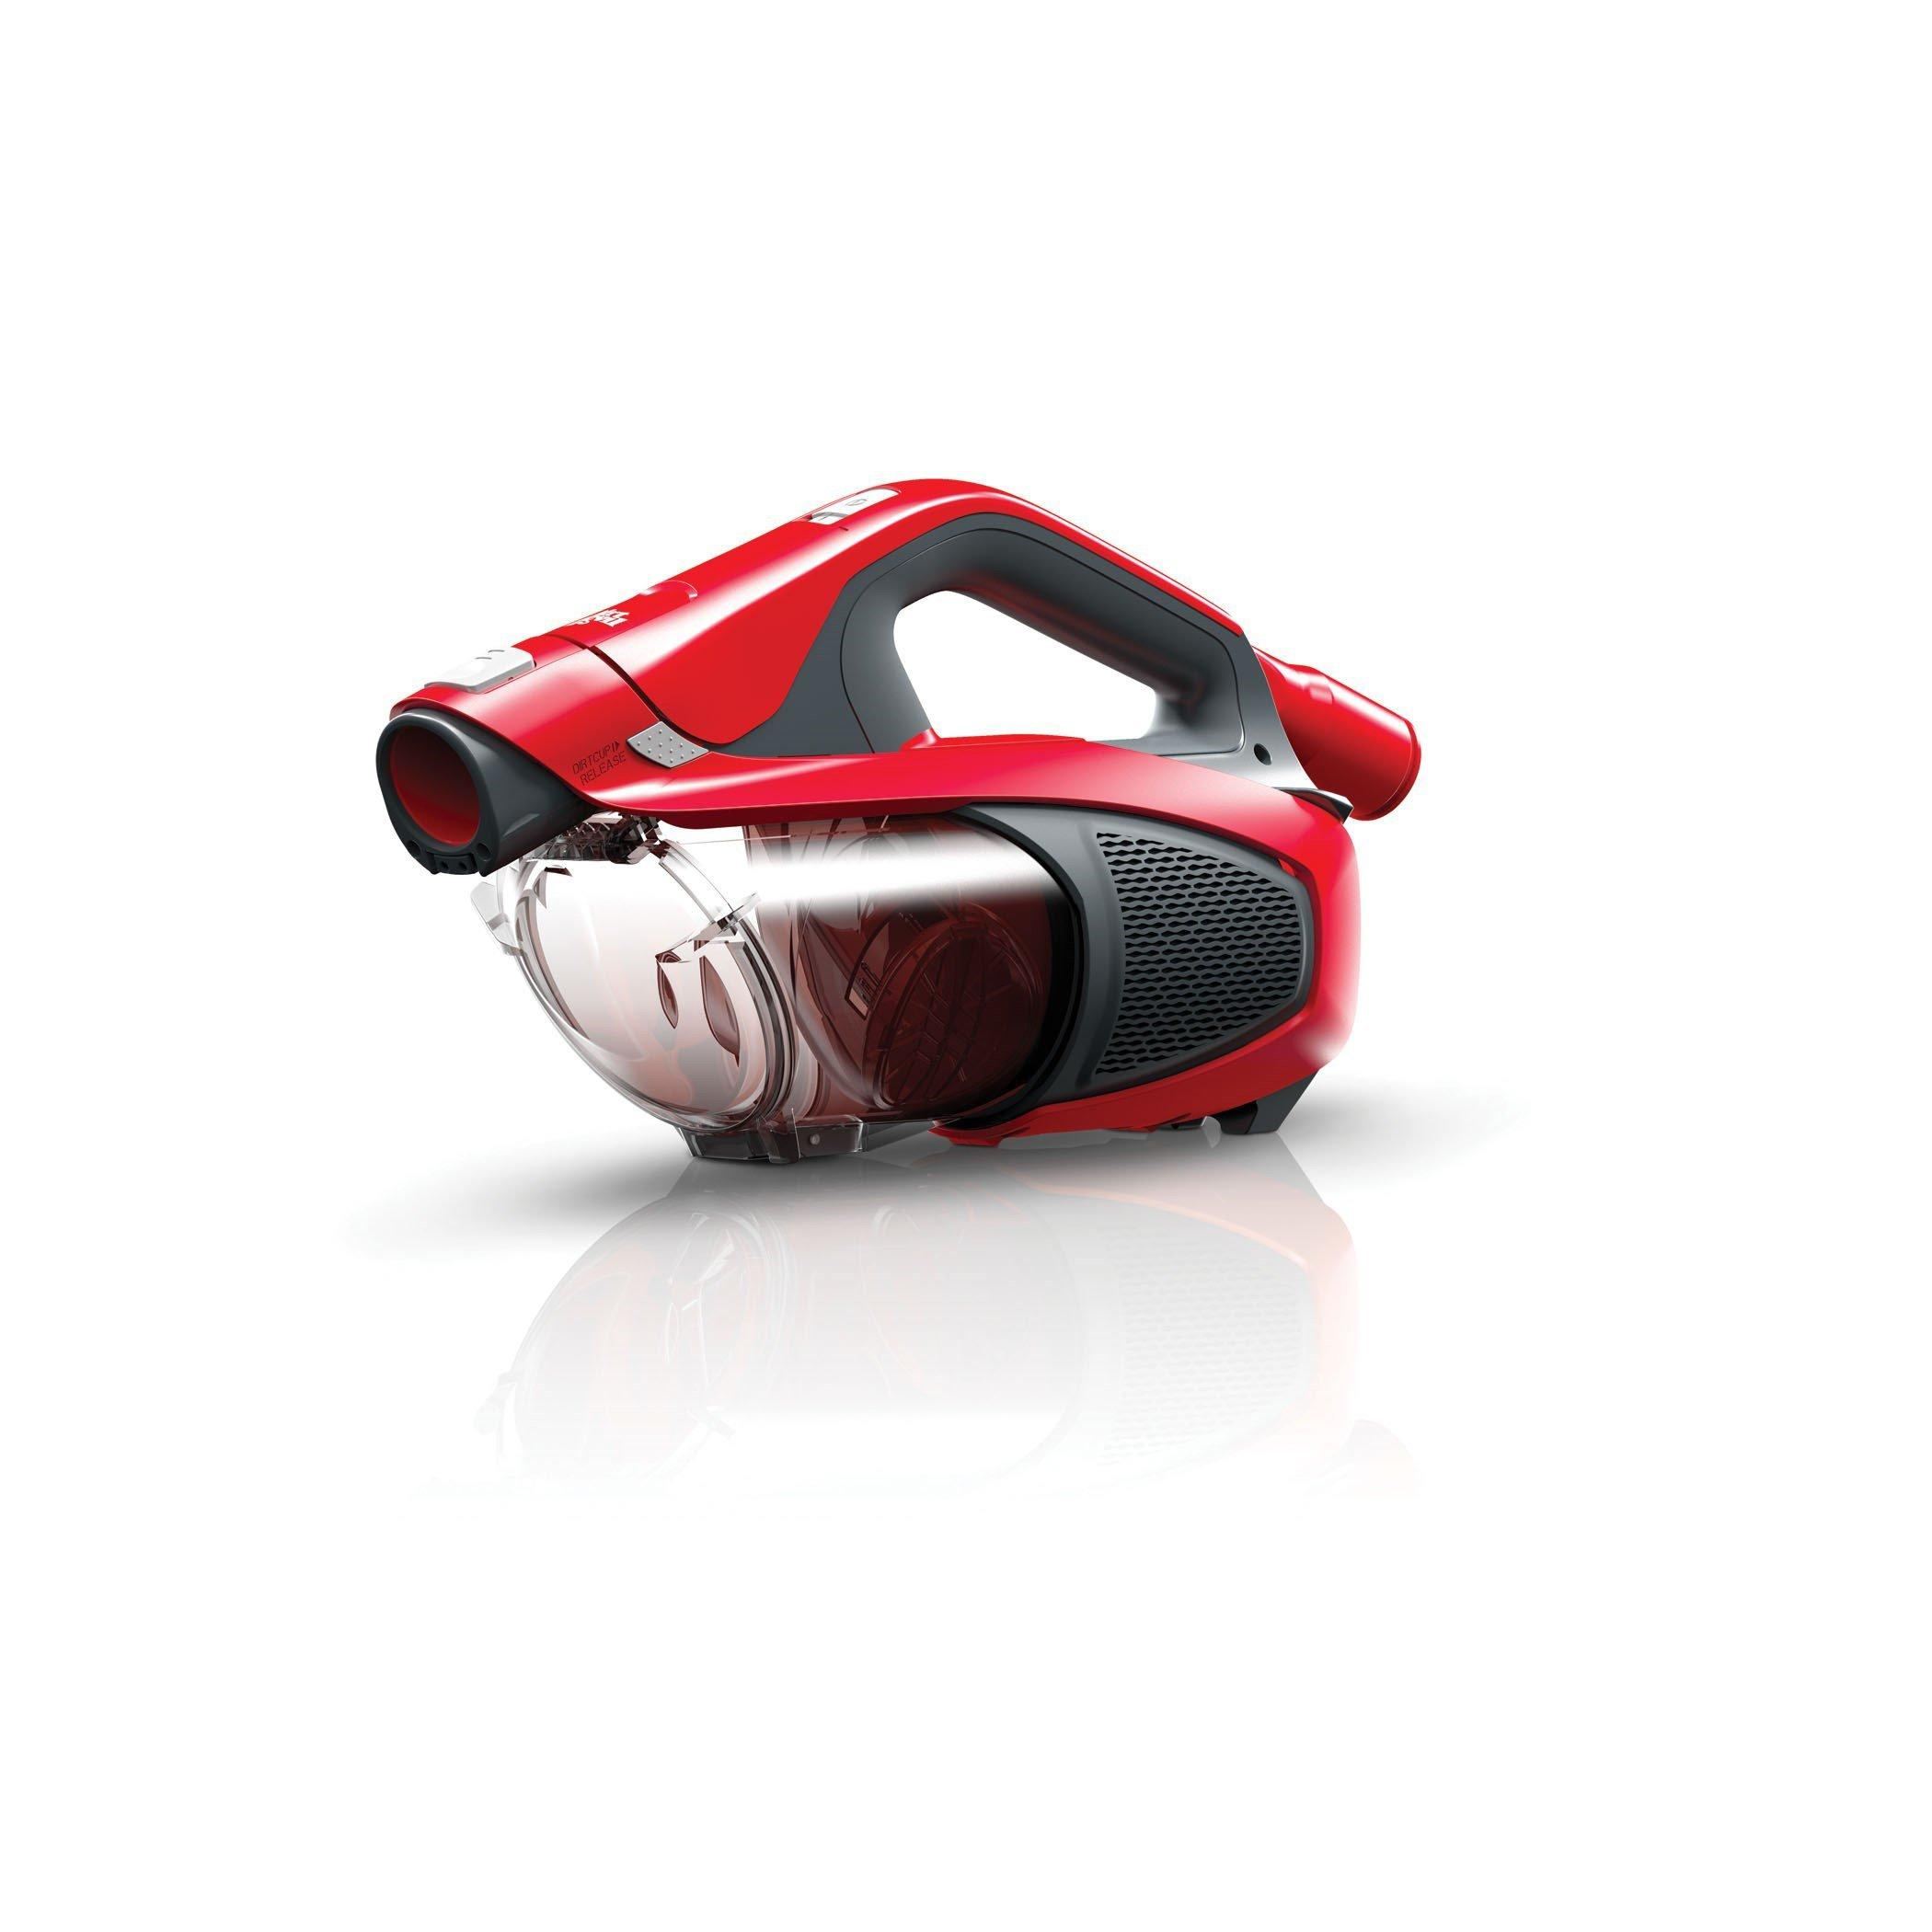 Reconditioned 360 Reach Pro Bagless Stick Vacuum2